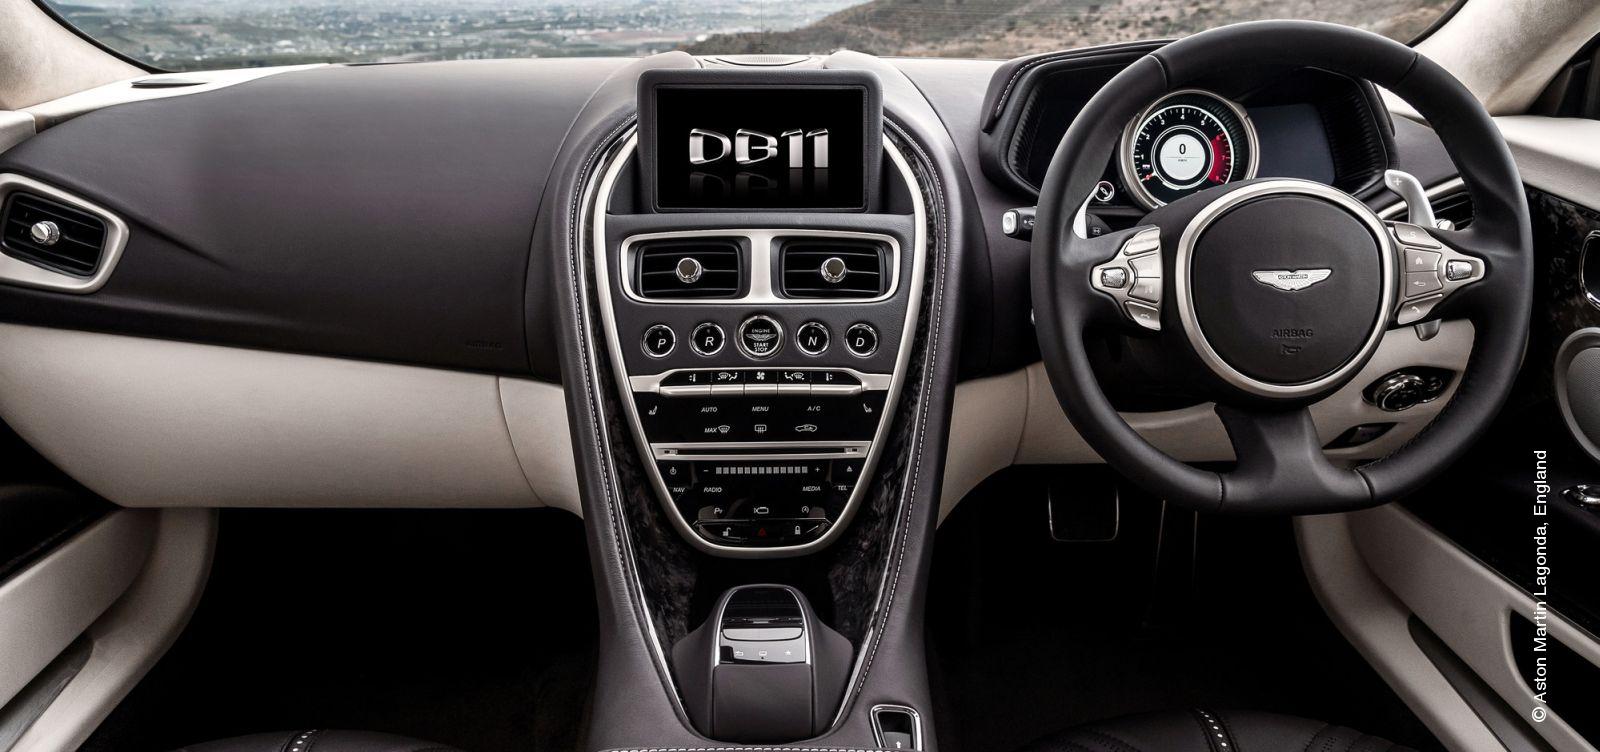 Console and decorative elements car interior